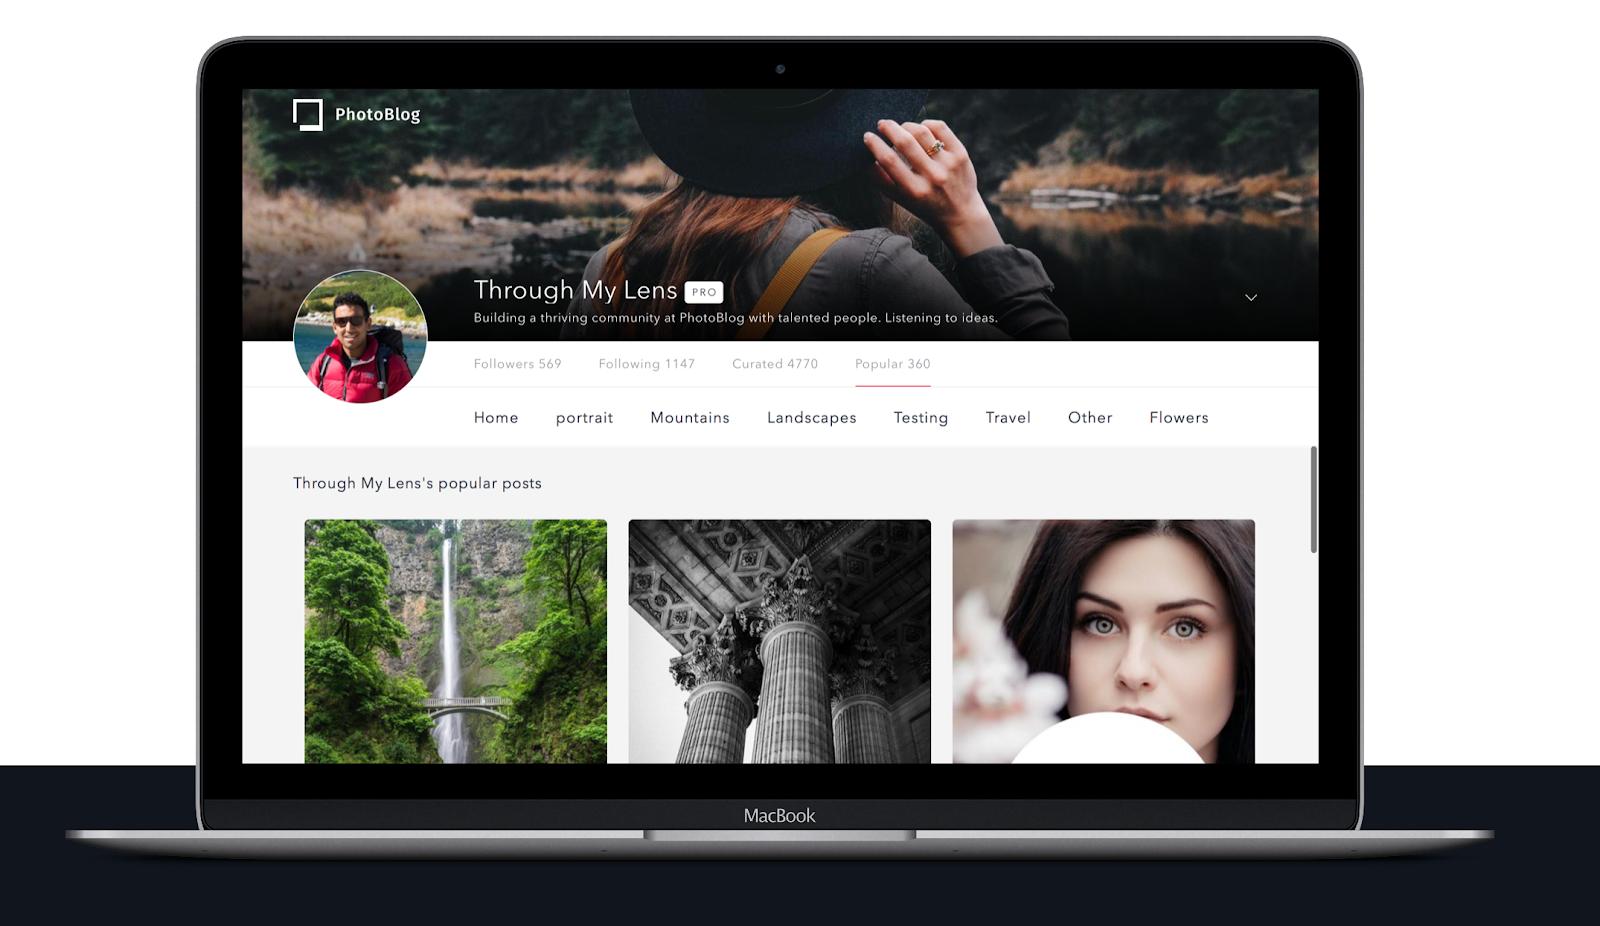 Example Photoblog profile